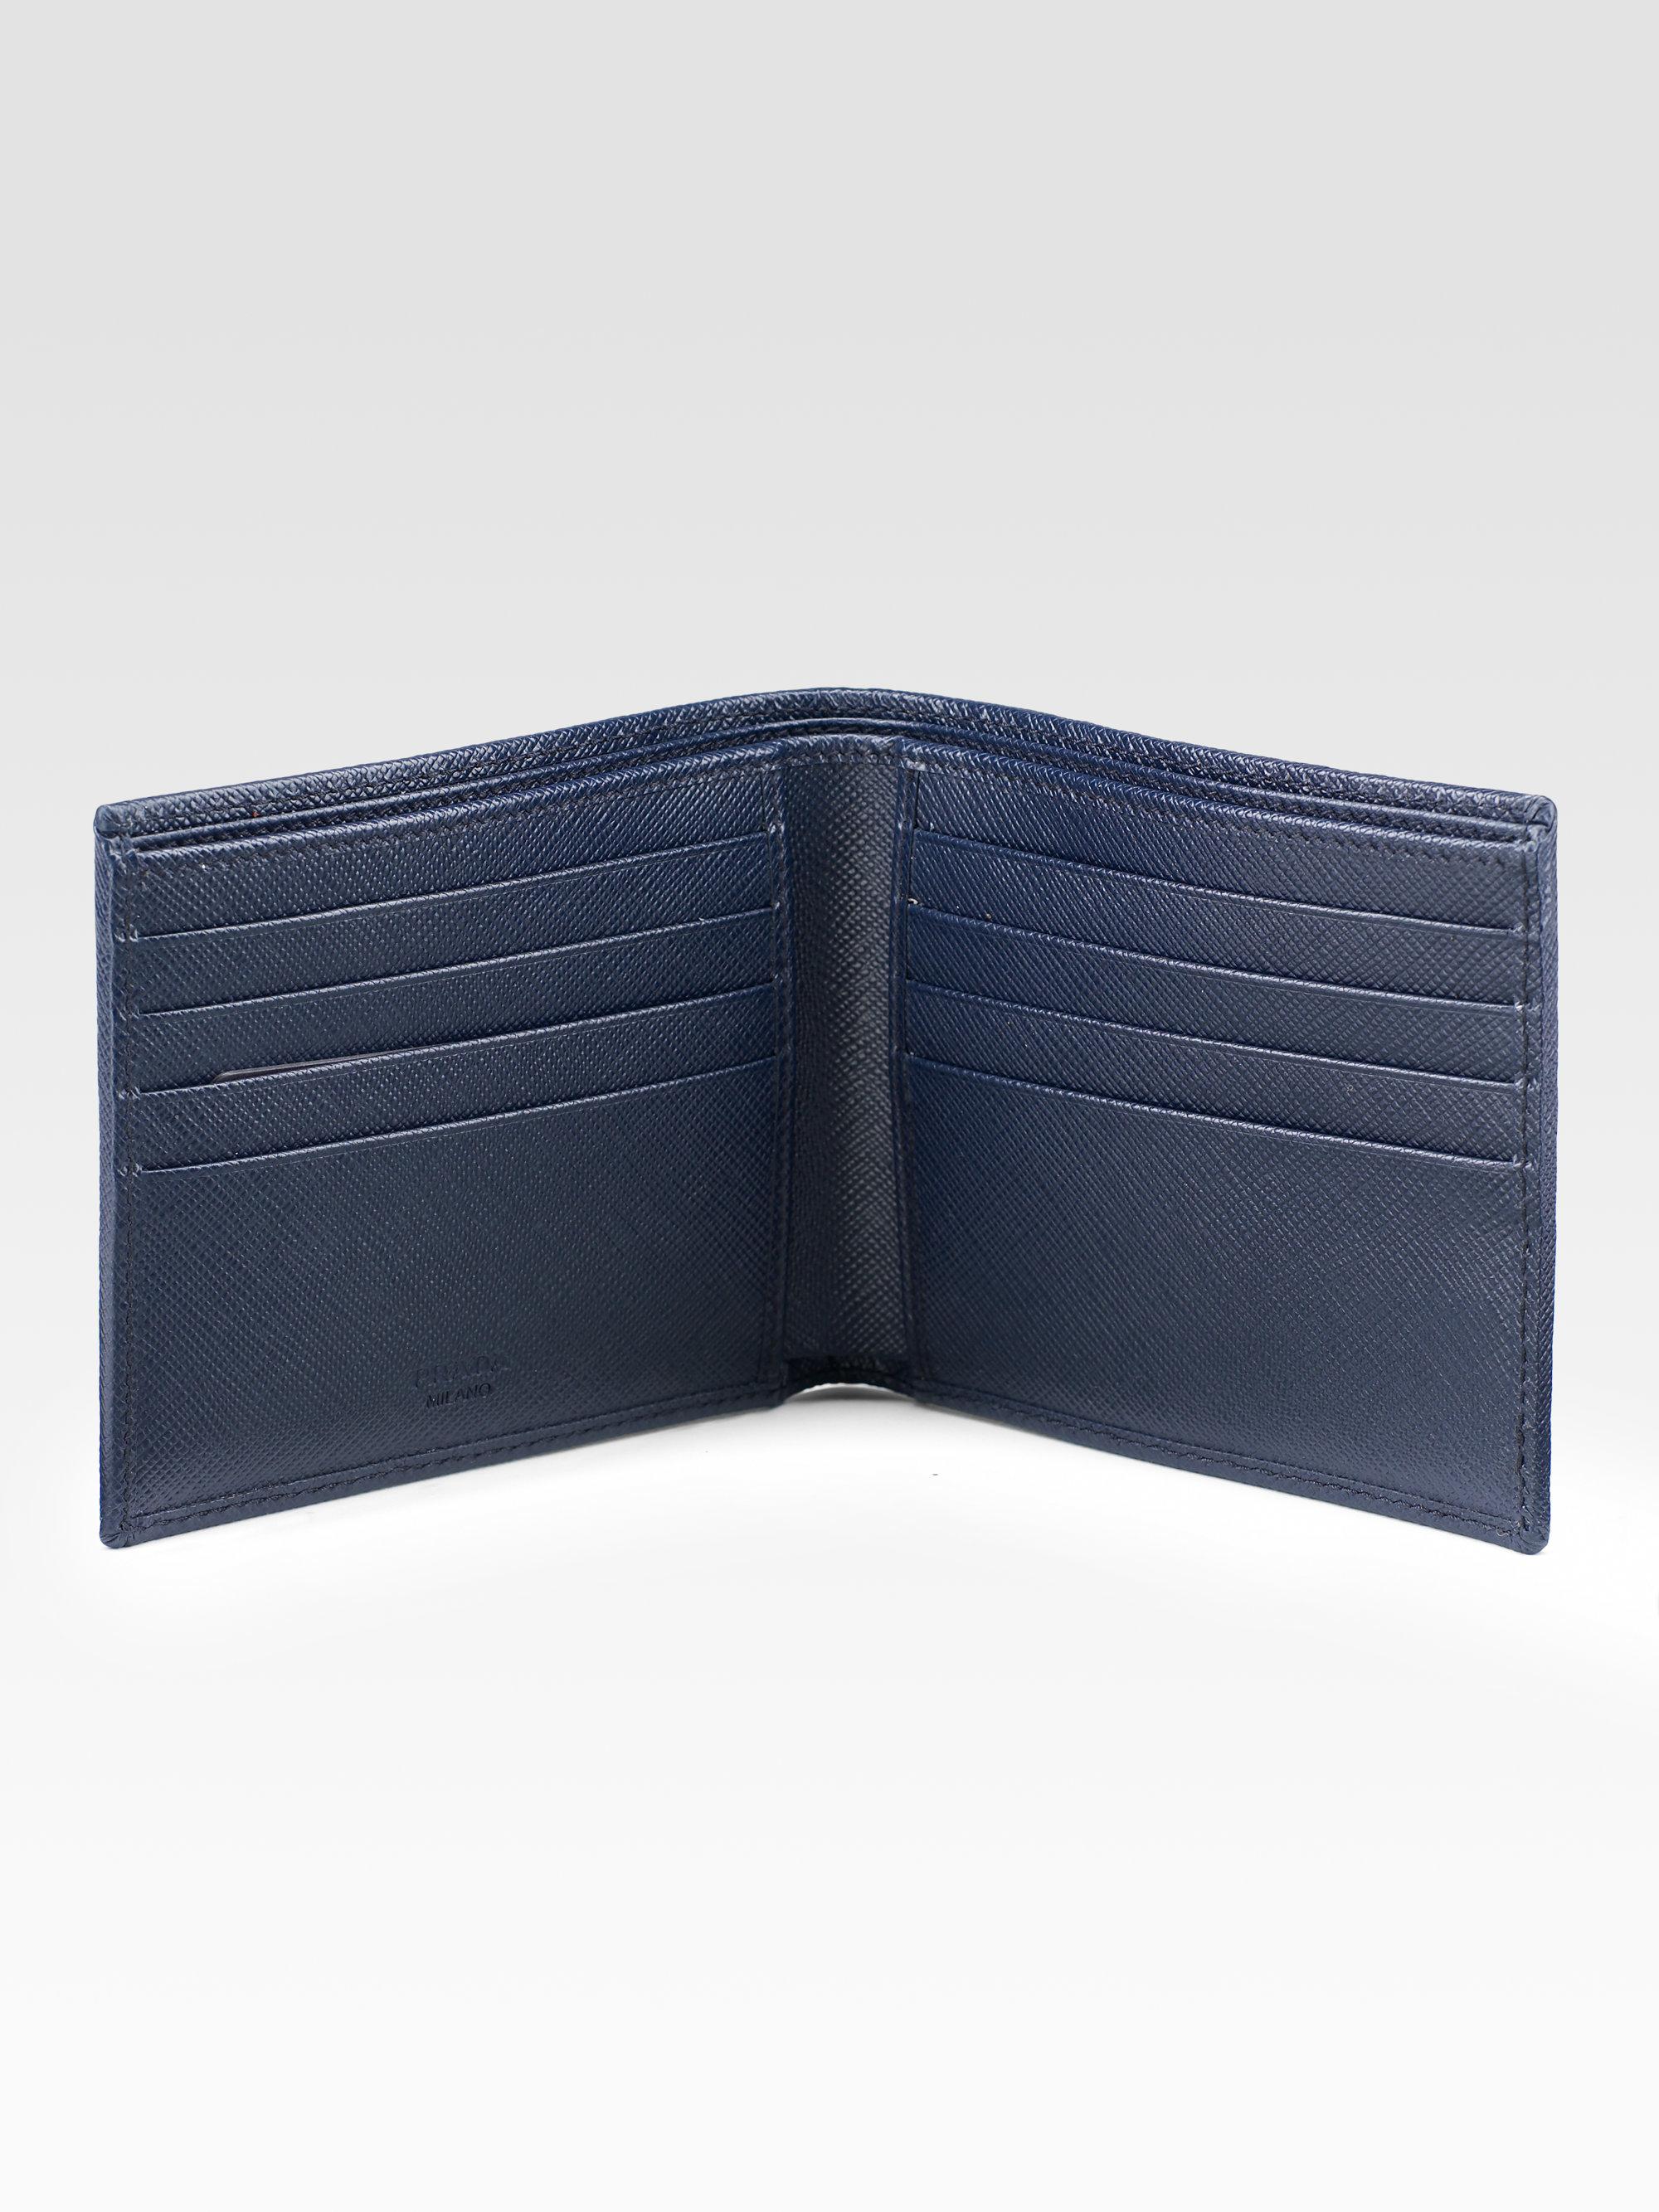 e25836f74ea665 italy prada textured leather wallet navy e9b2c e57c7; top quality lyst prada  intreccio bi fold wallet in blue for men 5a085 52b0e